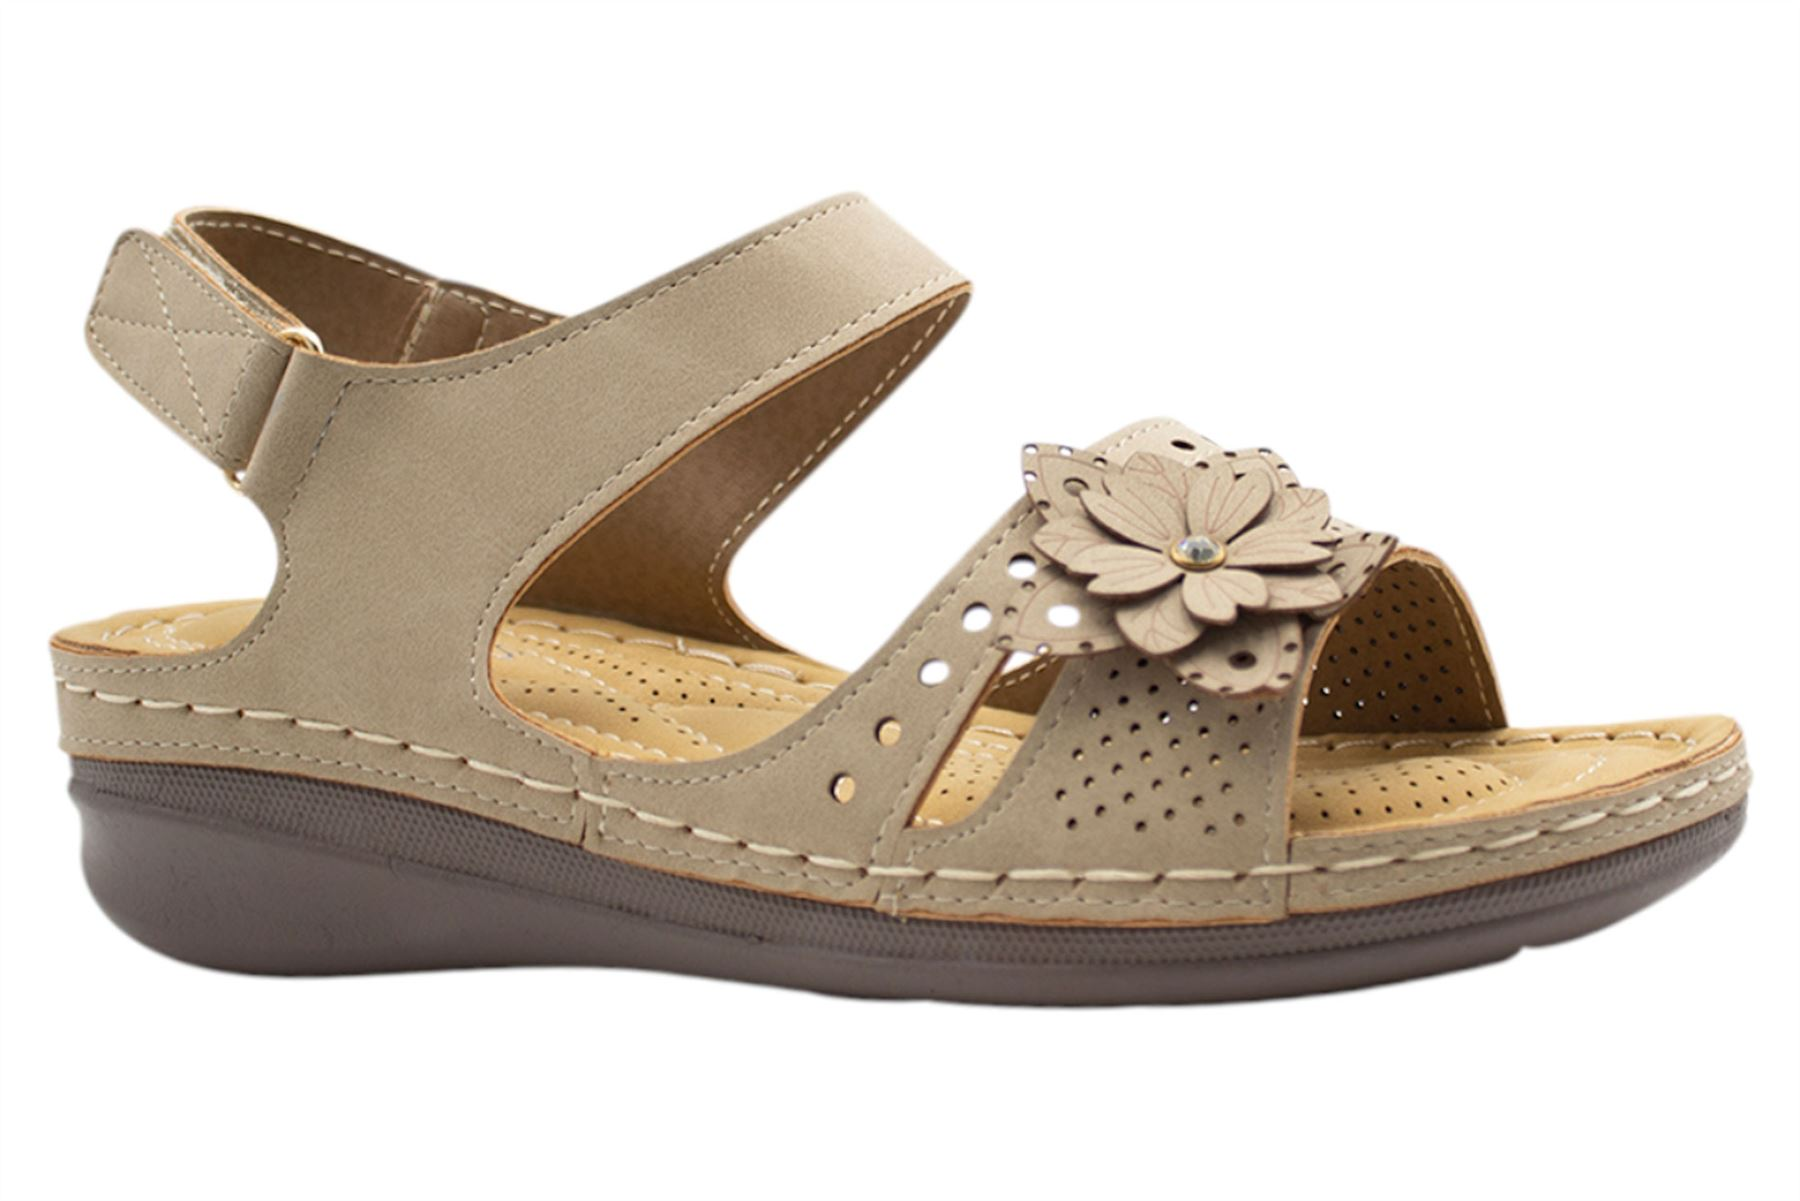 Ladies-Wedge-Heel-Sandal-Womens-Comfort-Cushion-Strapy-Summer-Shoes miniatura 4